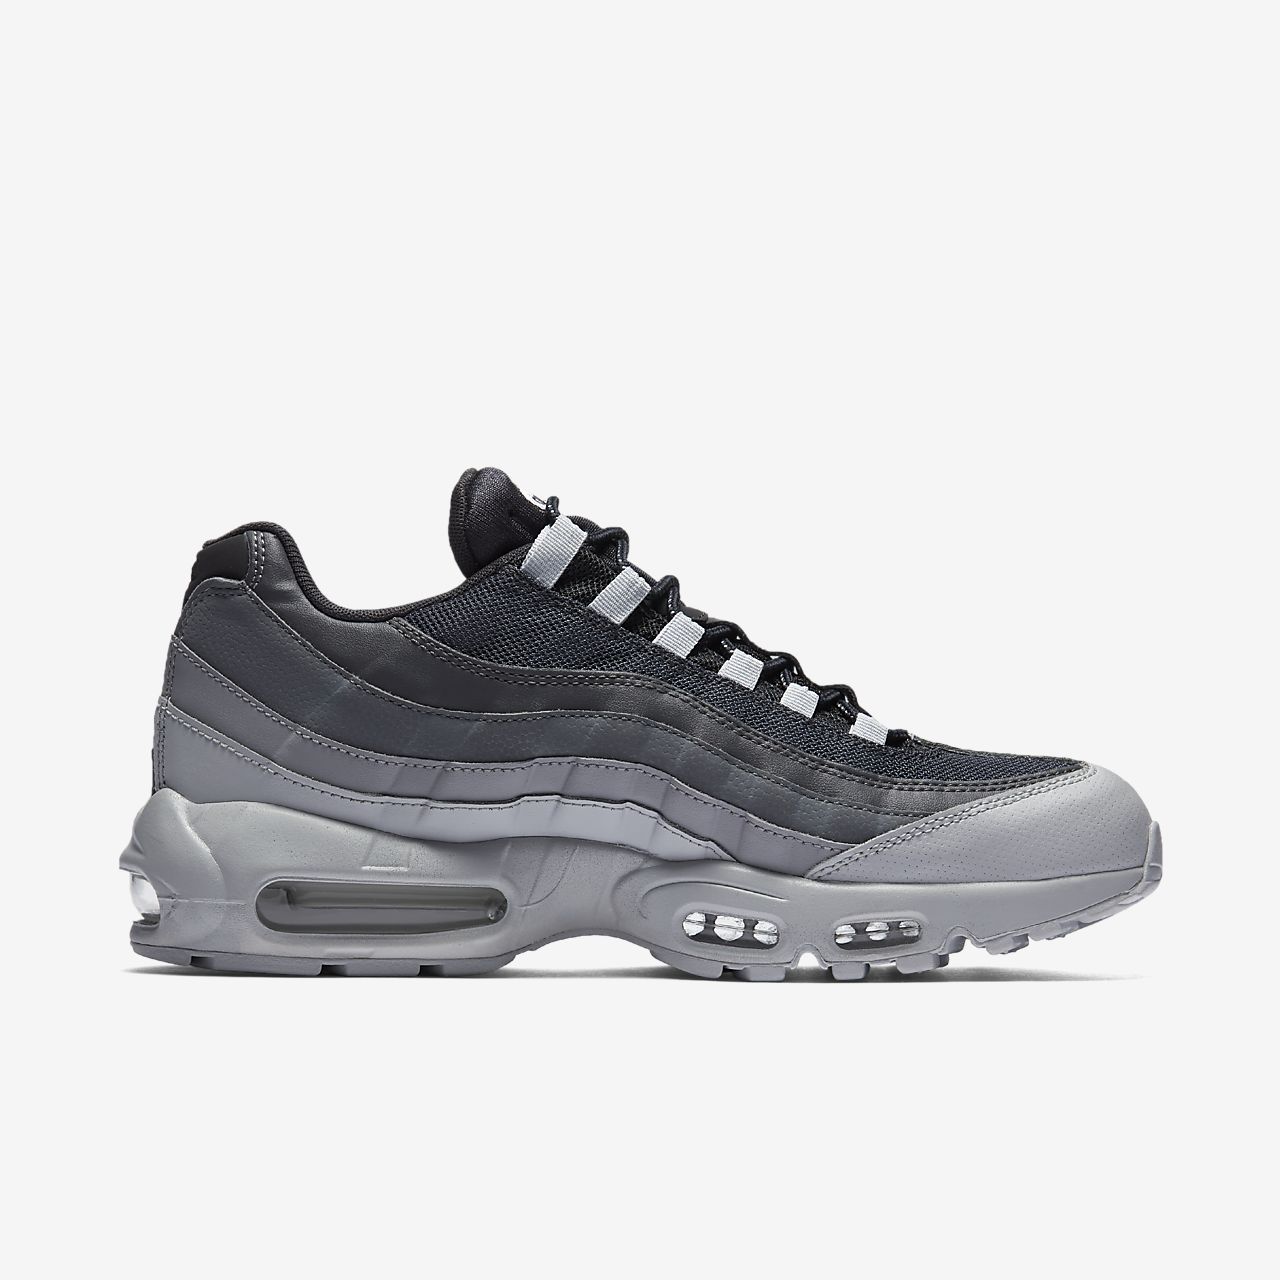 ... Nike Air Max 95 Essential Men's Shoe